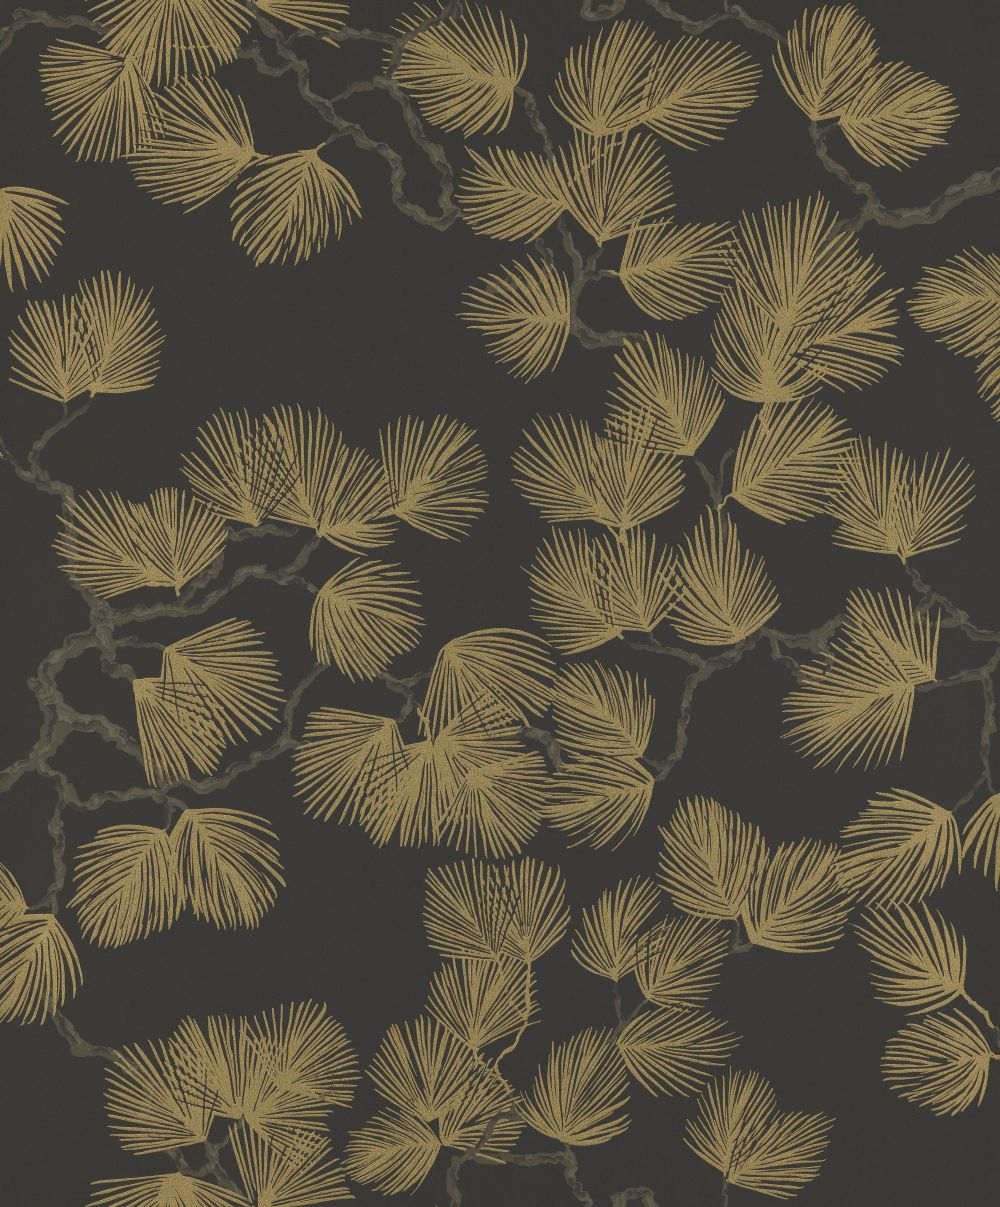 Sandberg Pine Gold / Black Wallpaper - Product code: 804-99